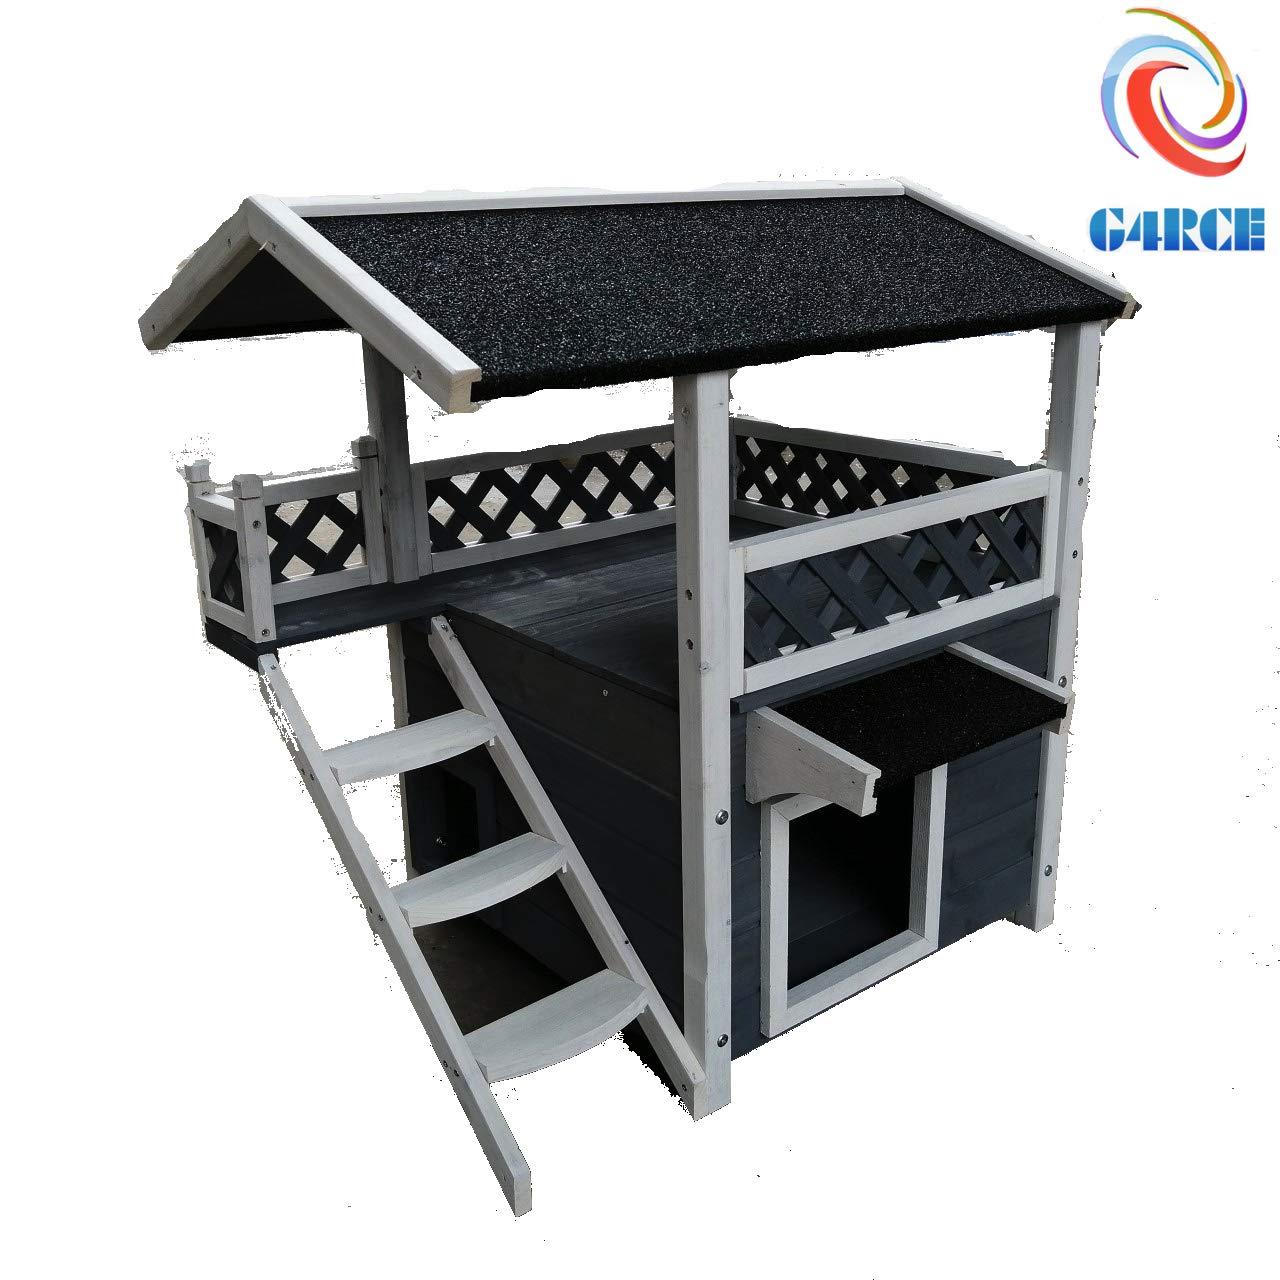 G4RCE® Cat House Den Wooden Maisonette Shelter Bed Fence Stair Step Dog Pet Hut UK